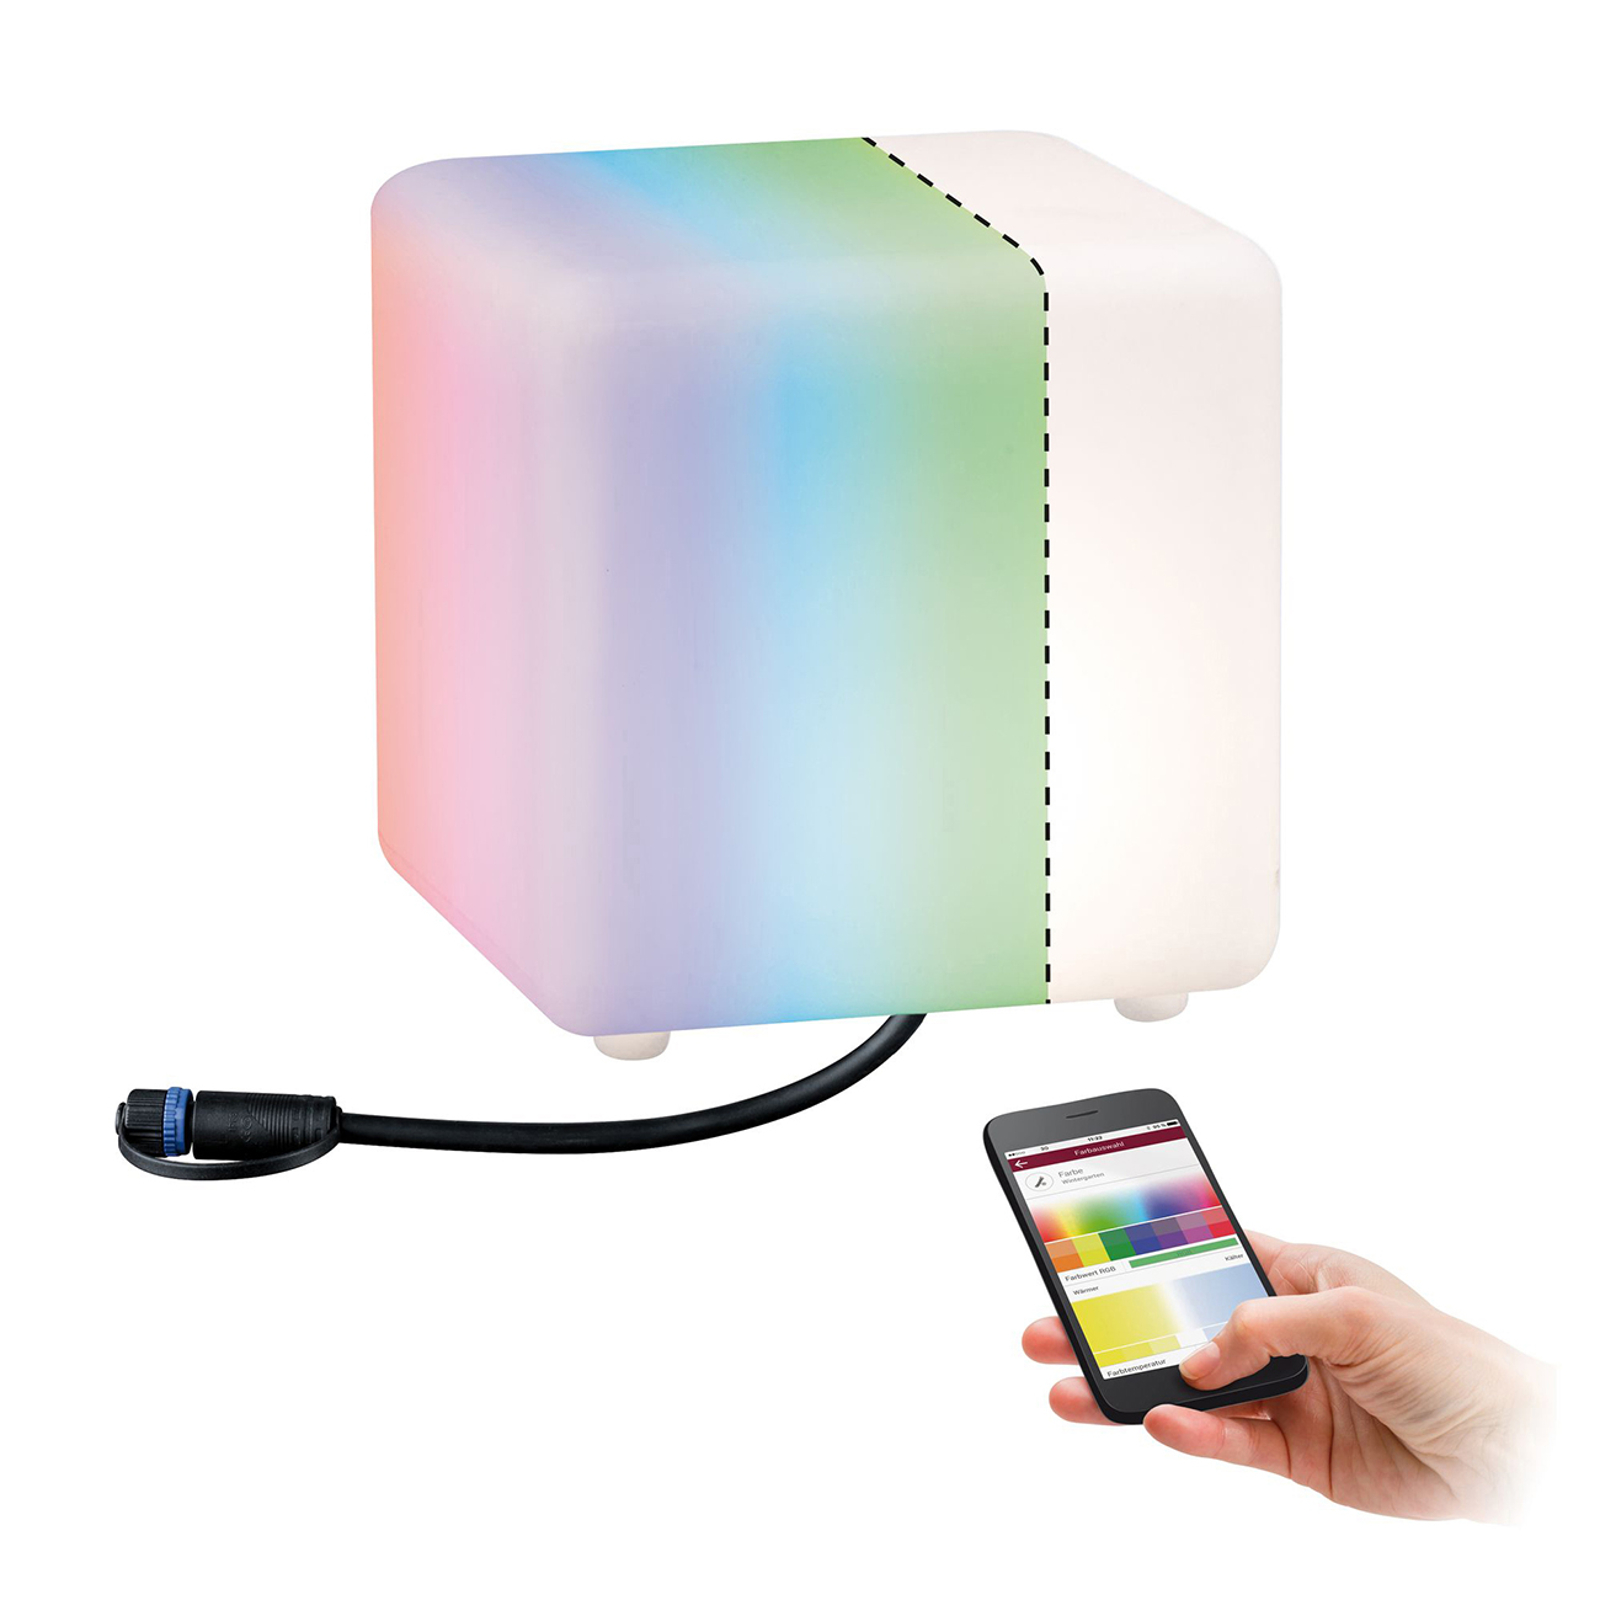 Dove acquistare Paulmann Plug & Shine decorativo Cube, ZigBee RGBW